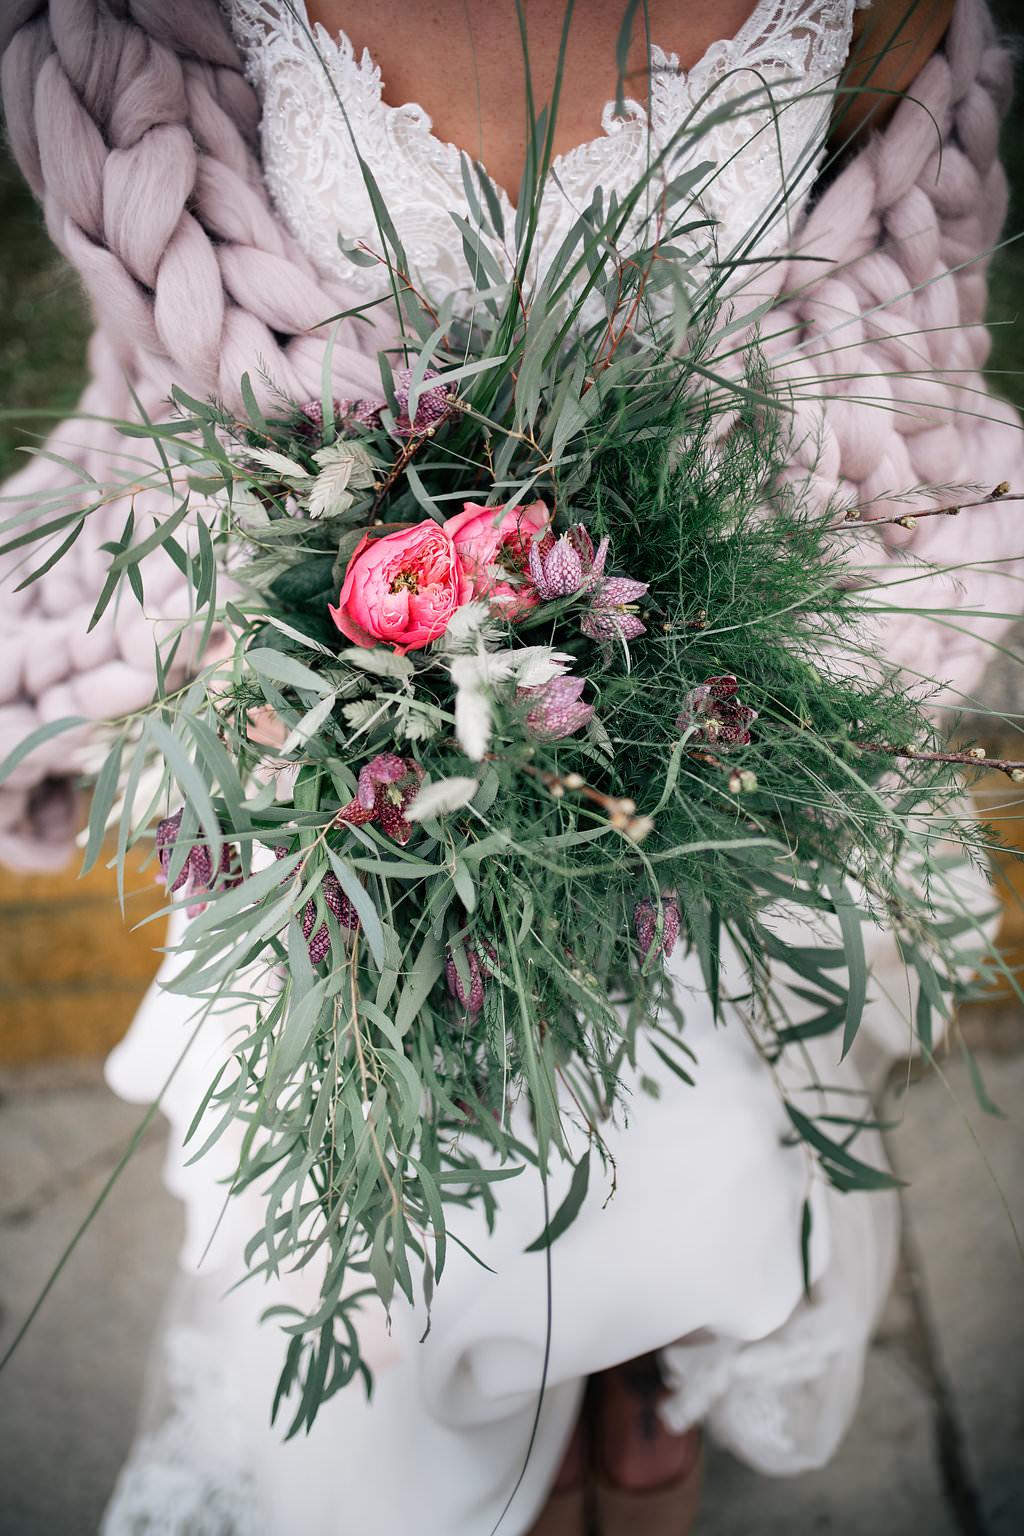 Bouquet Bride Bridal Flowers Greenery Foliage Hellebore Peony Lapstone Barn Wedding Ideas Cotswolds Katie Hamilton Photography